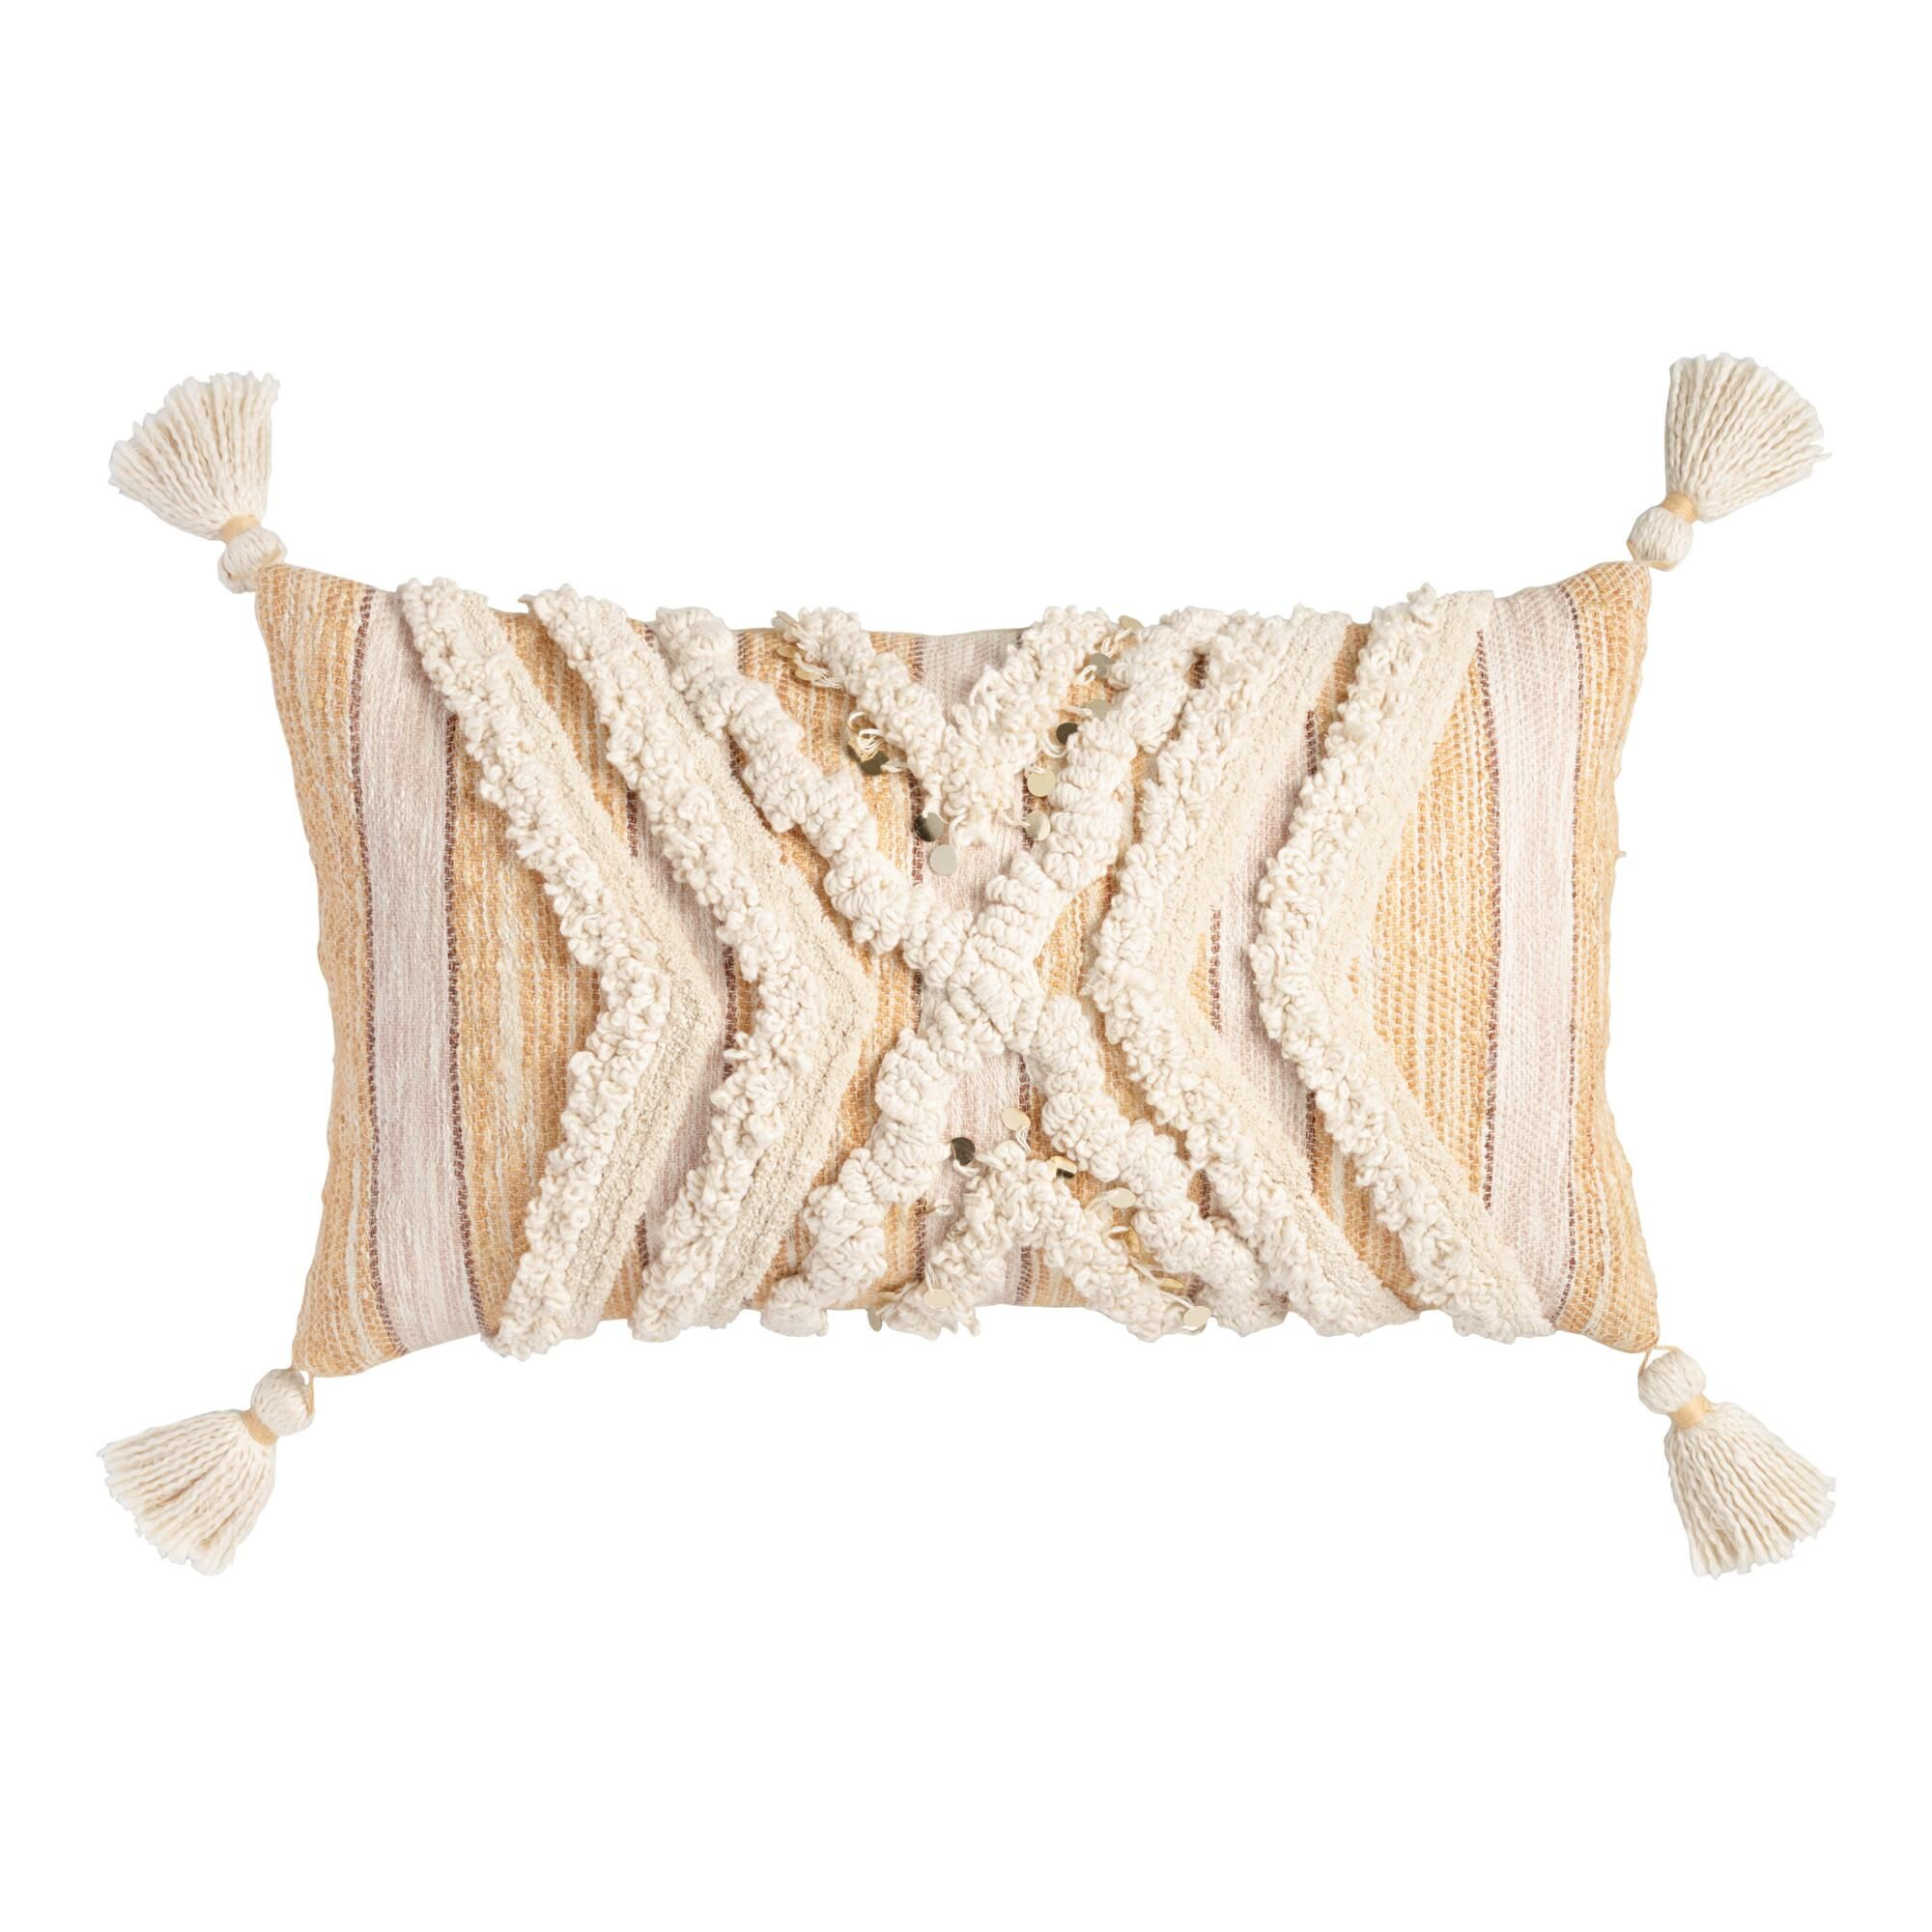 Moroccan Style Blanket Lumbar Pillow